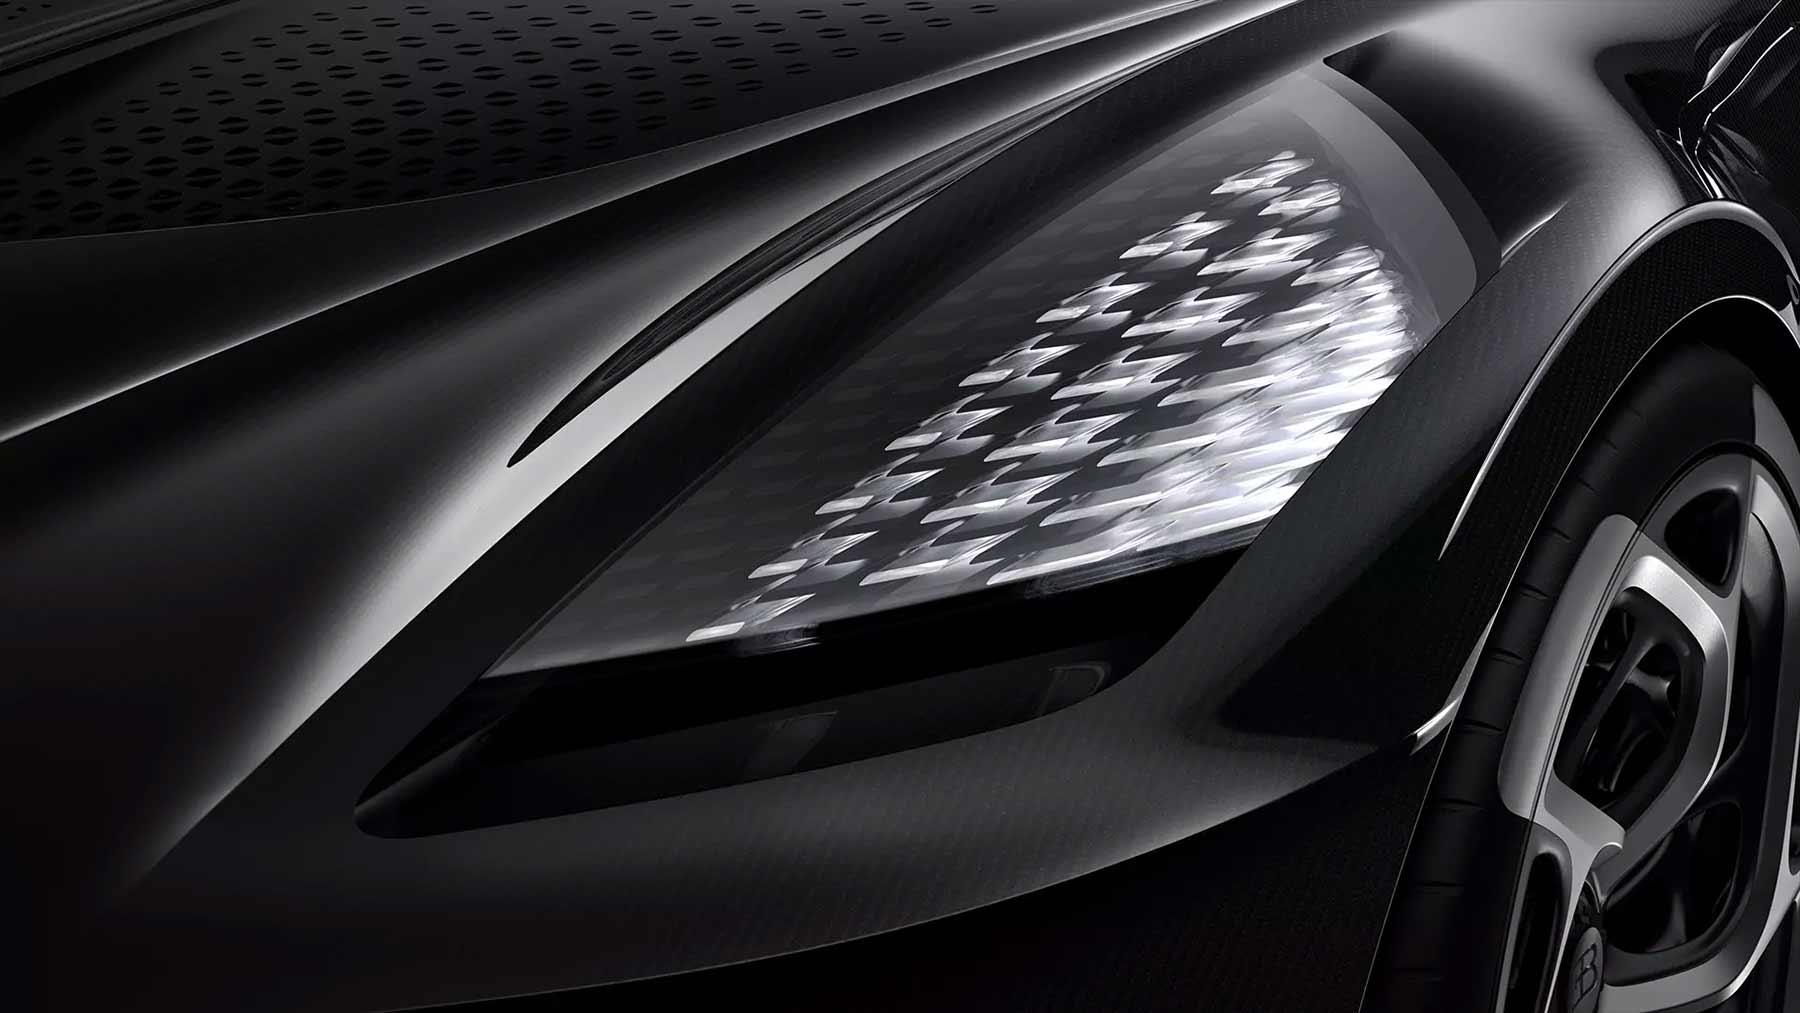 Bugatti La Voiture Noire Bugatti-La-Voiture-Noire_08